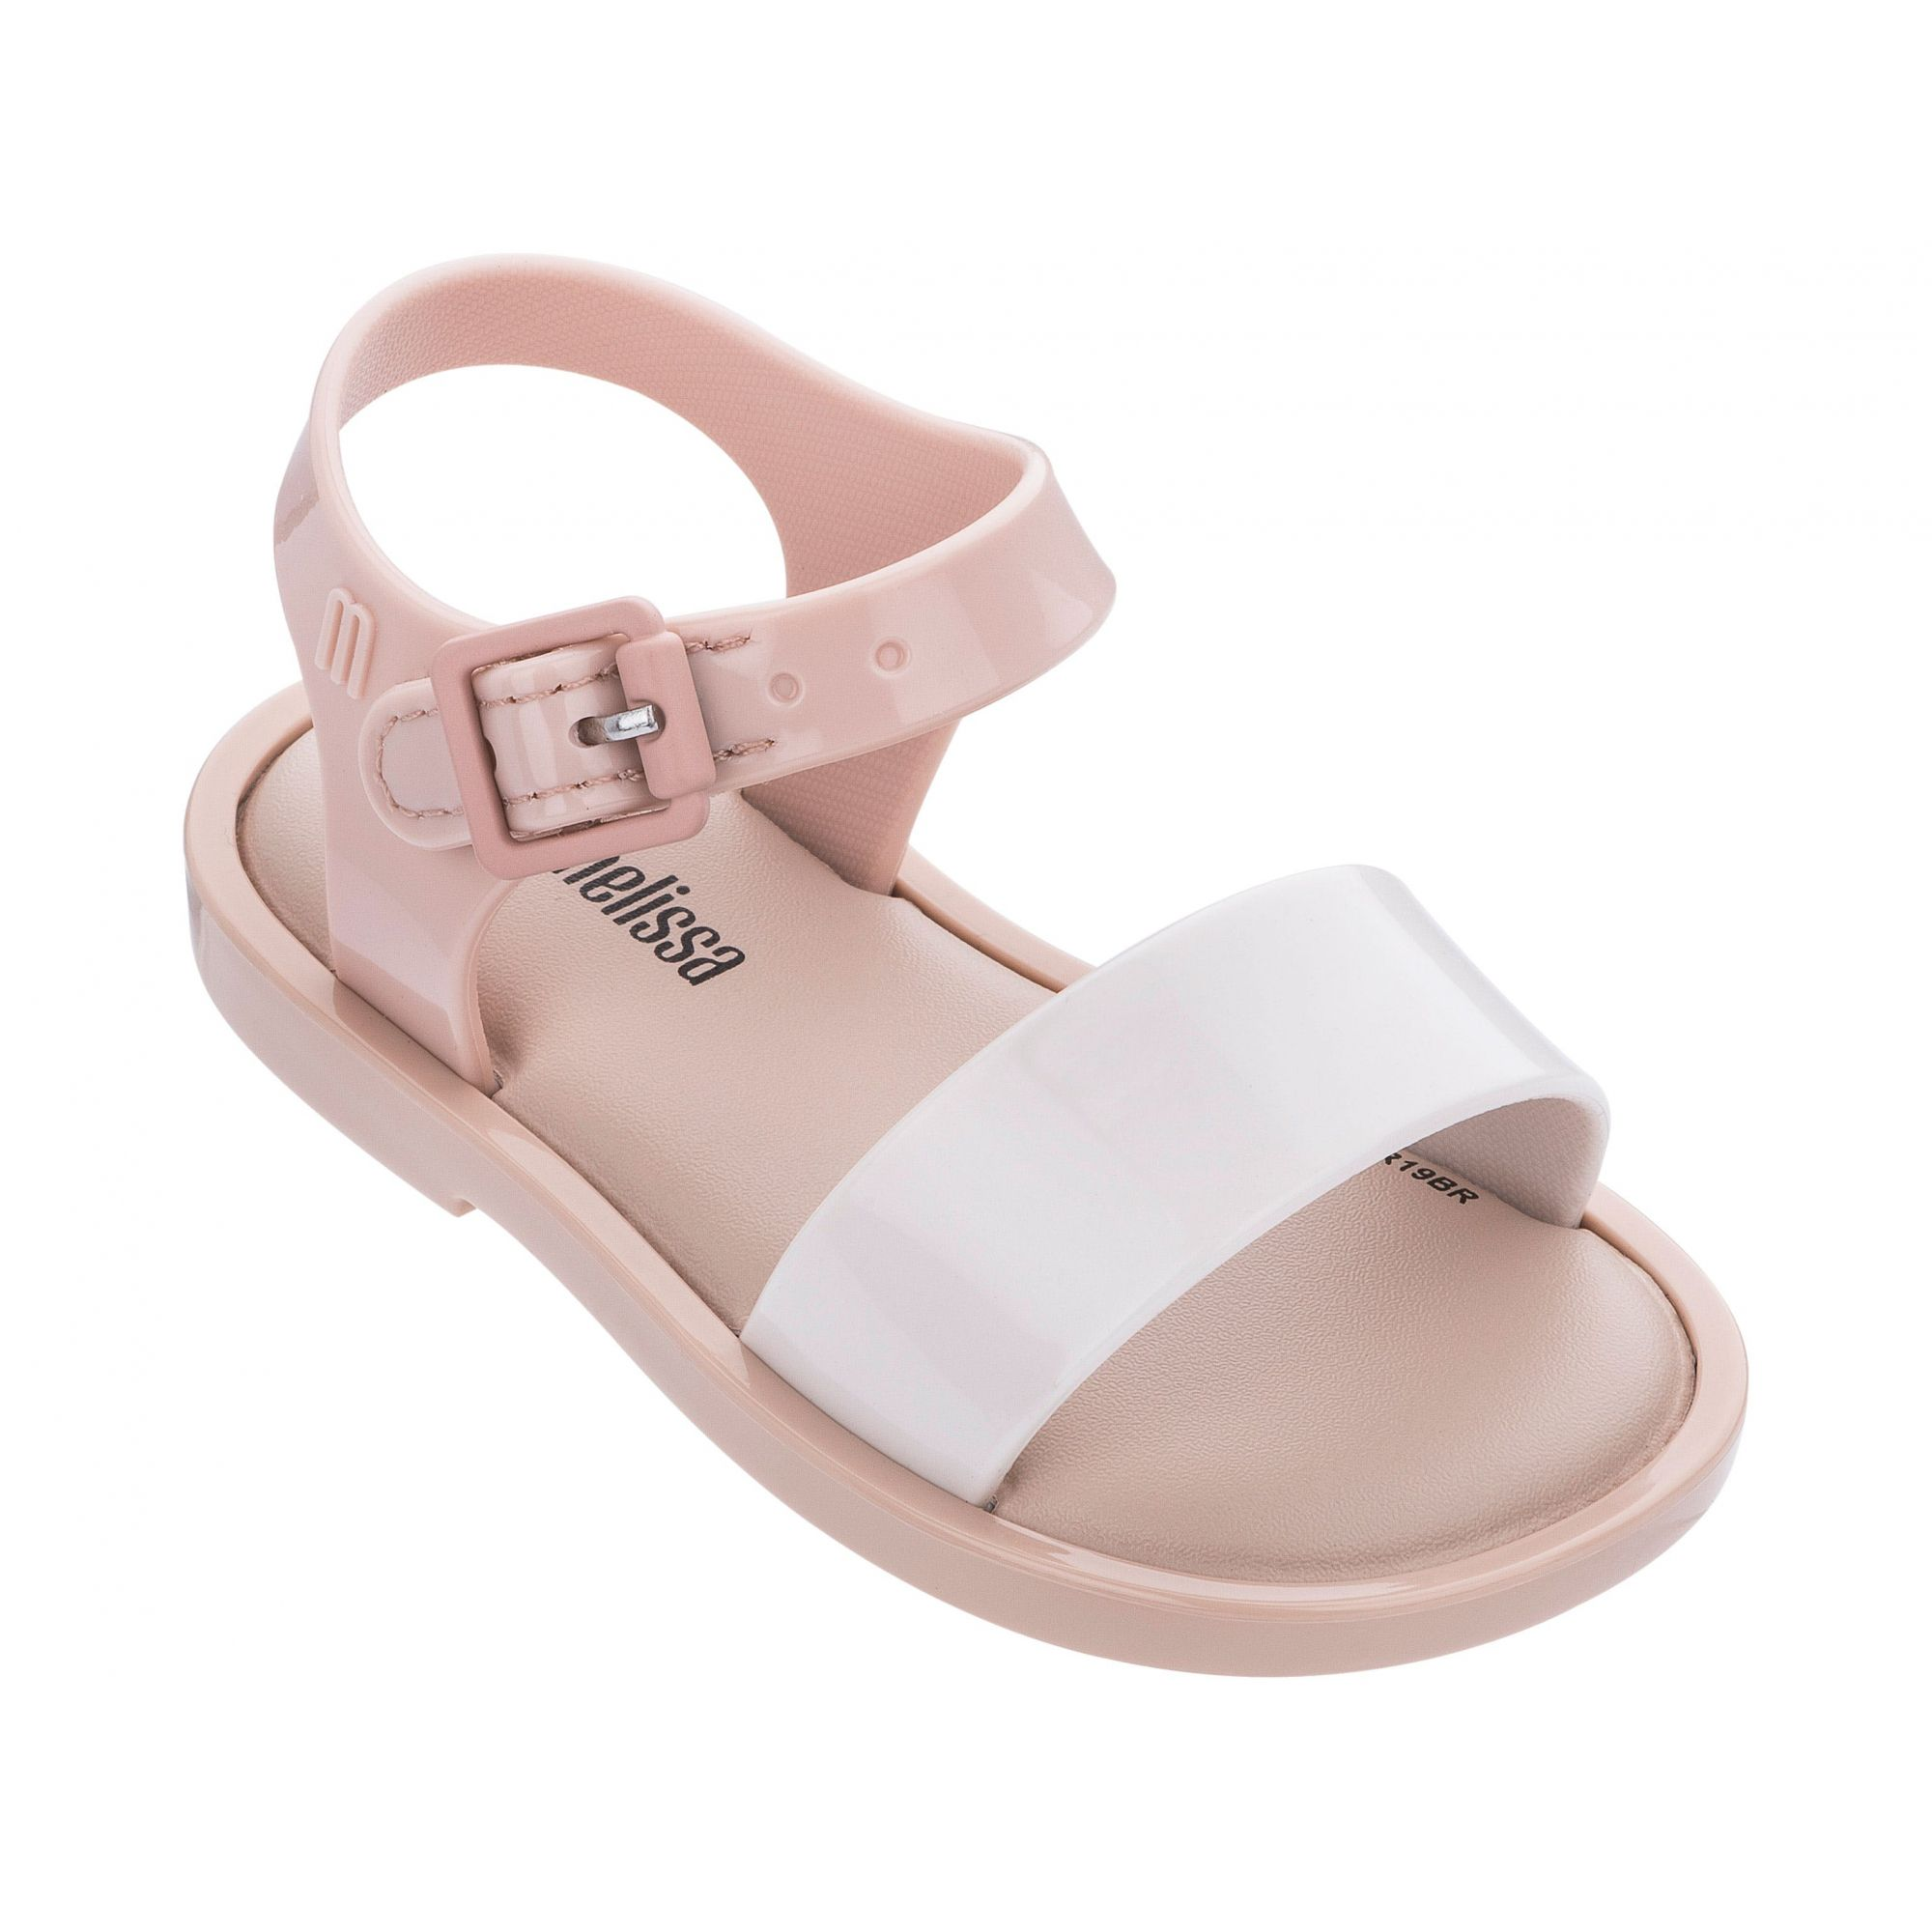 Mini Melissa Mar Sandal IV Bege Branco Marron